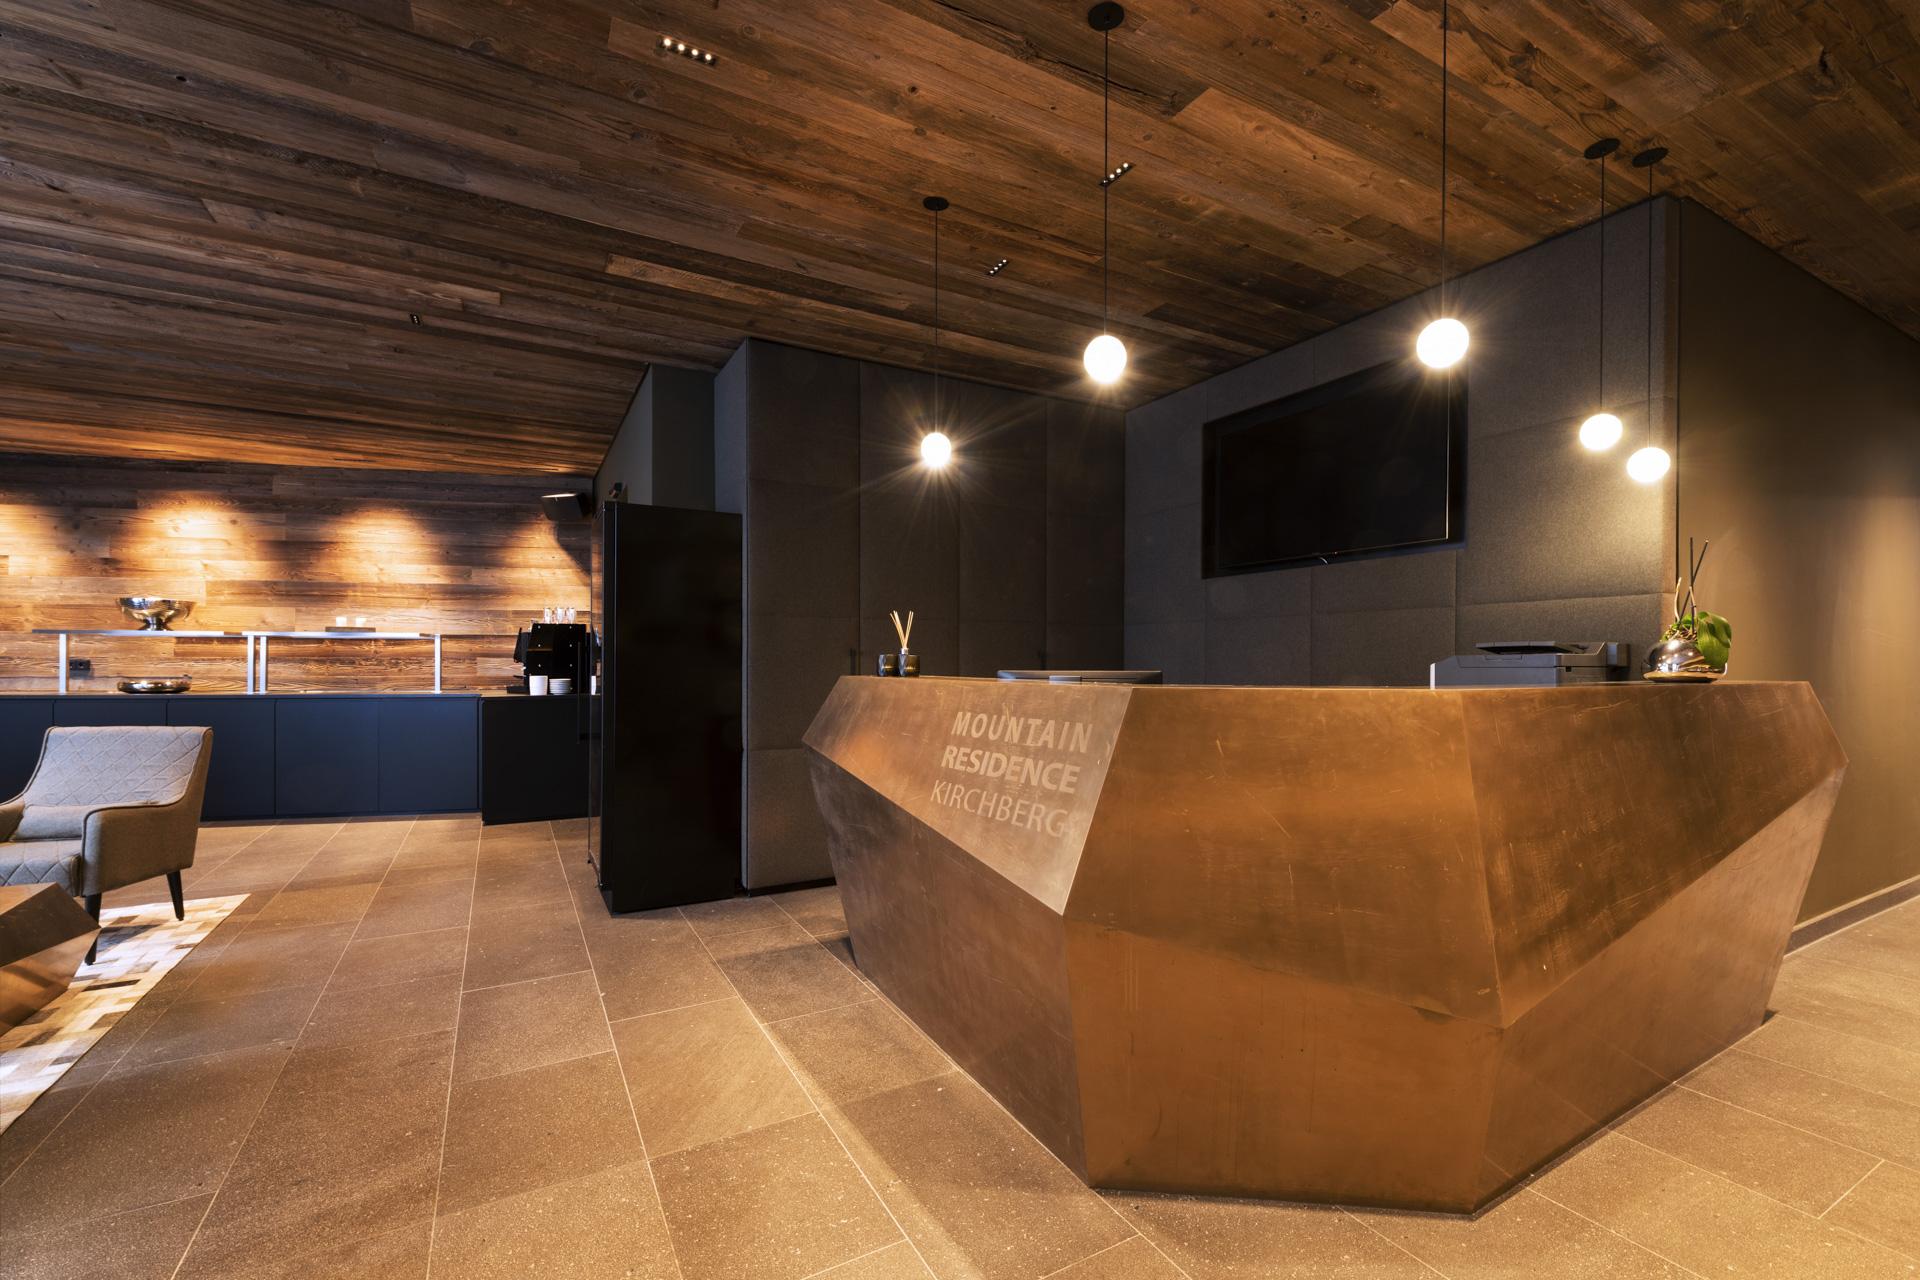 Tischlerei-Decker-Projekte-Mountain-Chalet-Kirchberg-Rezeption-Eingang